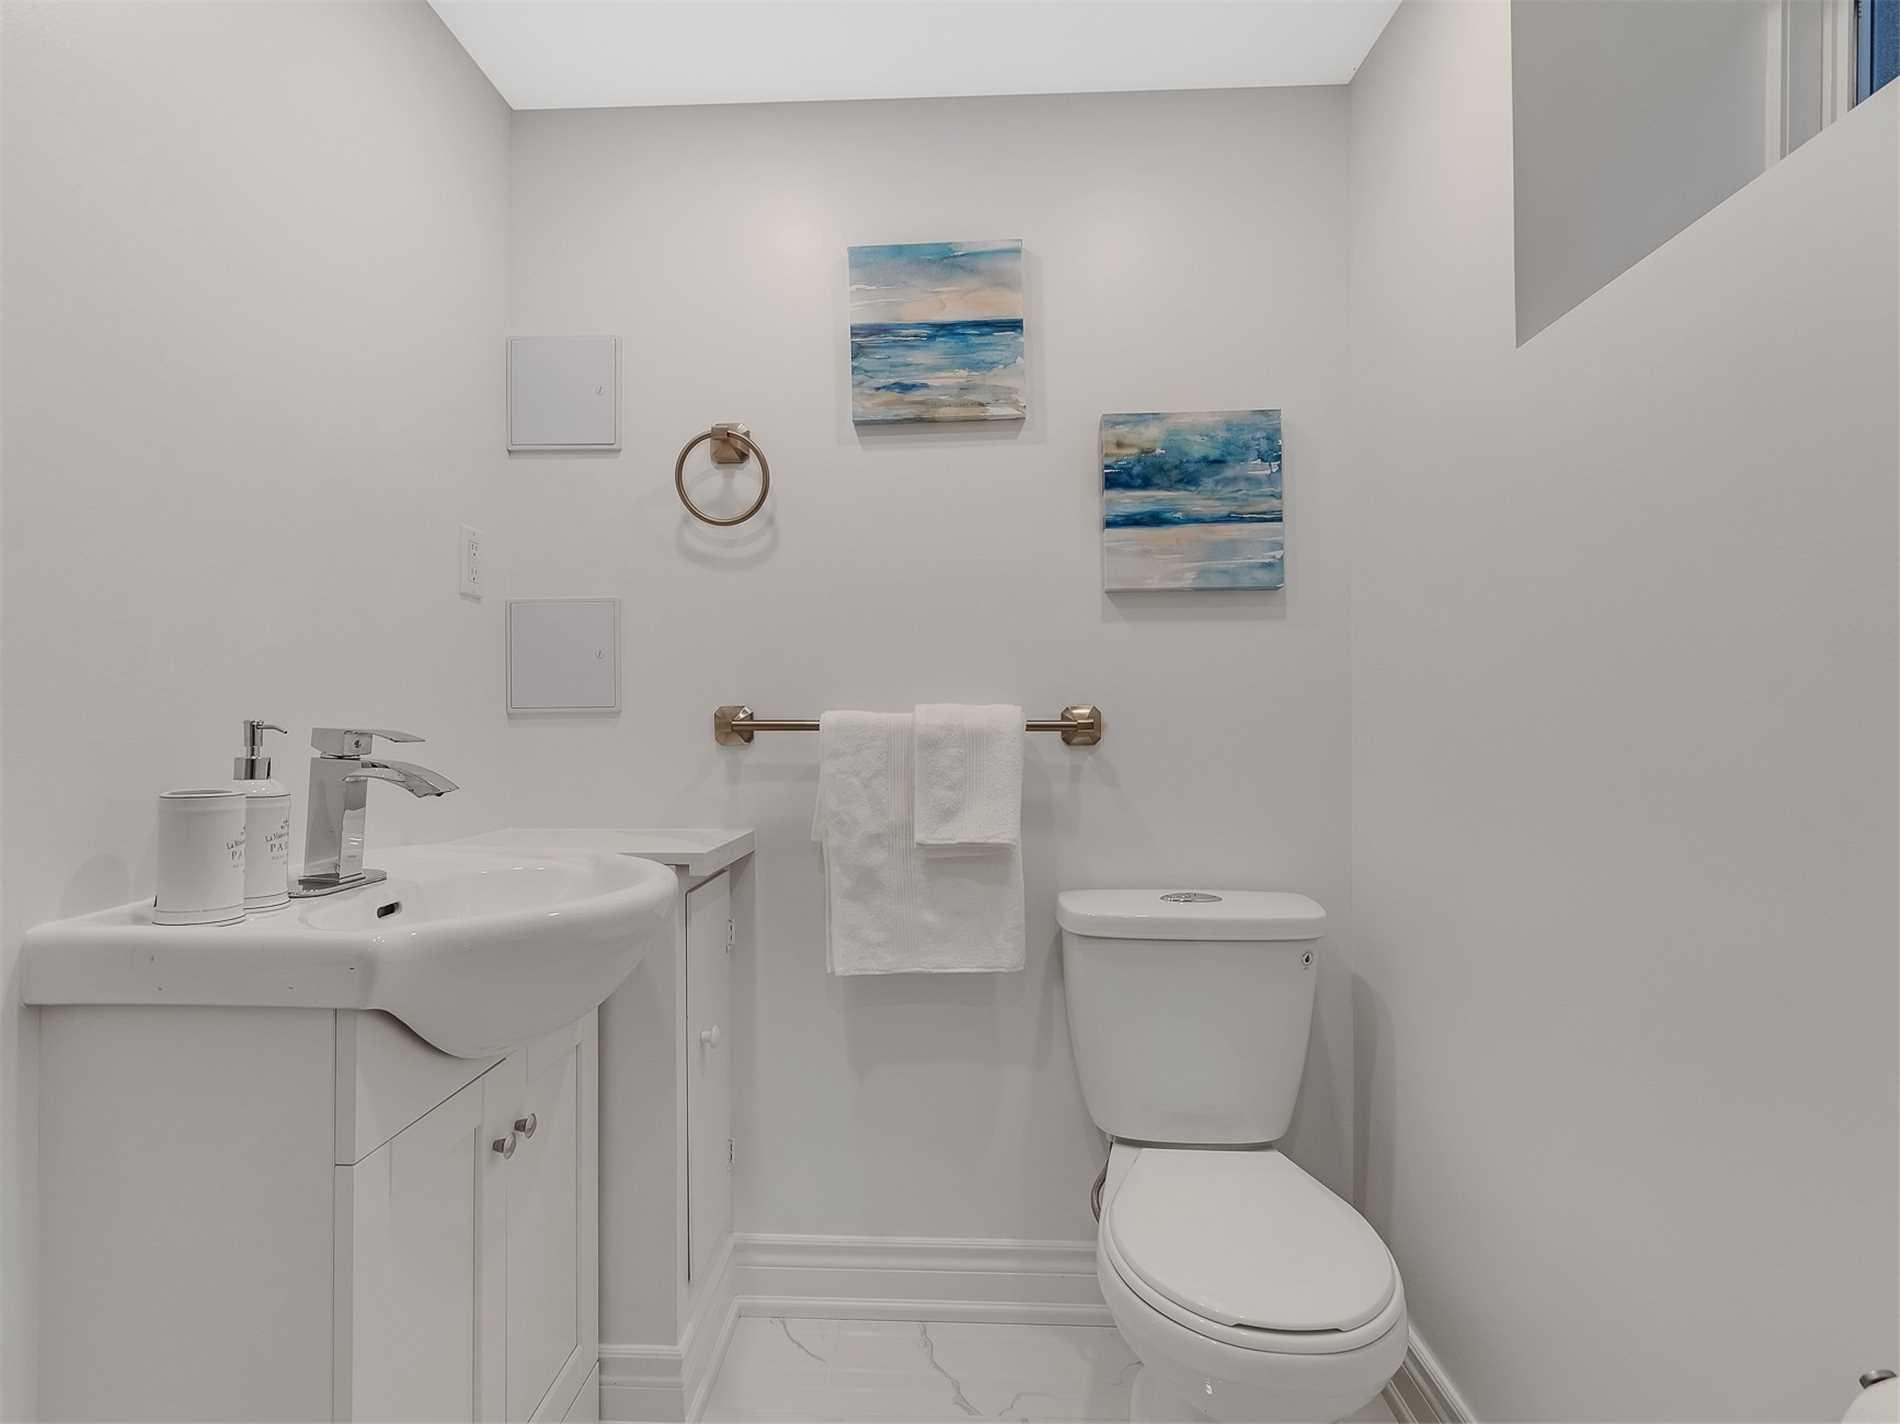 43 Rusholme Park Cres, Toronto, Ontario M6J2E1, 6 Bedrooms Bedrooms, 8 Rooms Rooms,3 BathroomsBathrooms,Detached,For Sale,Rusholme Park,C5358227